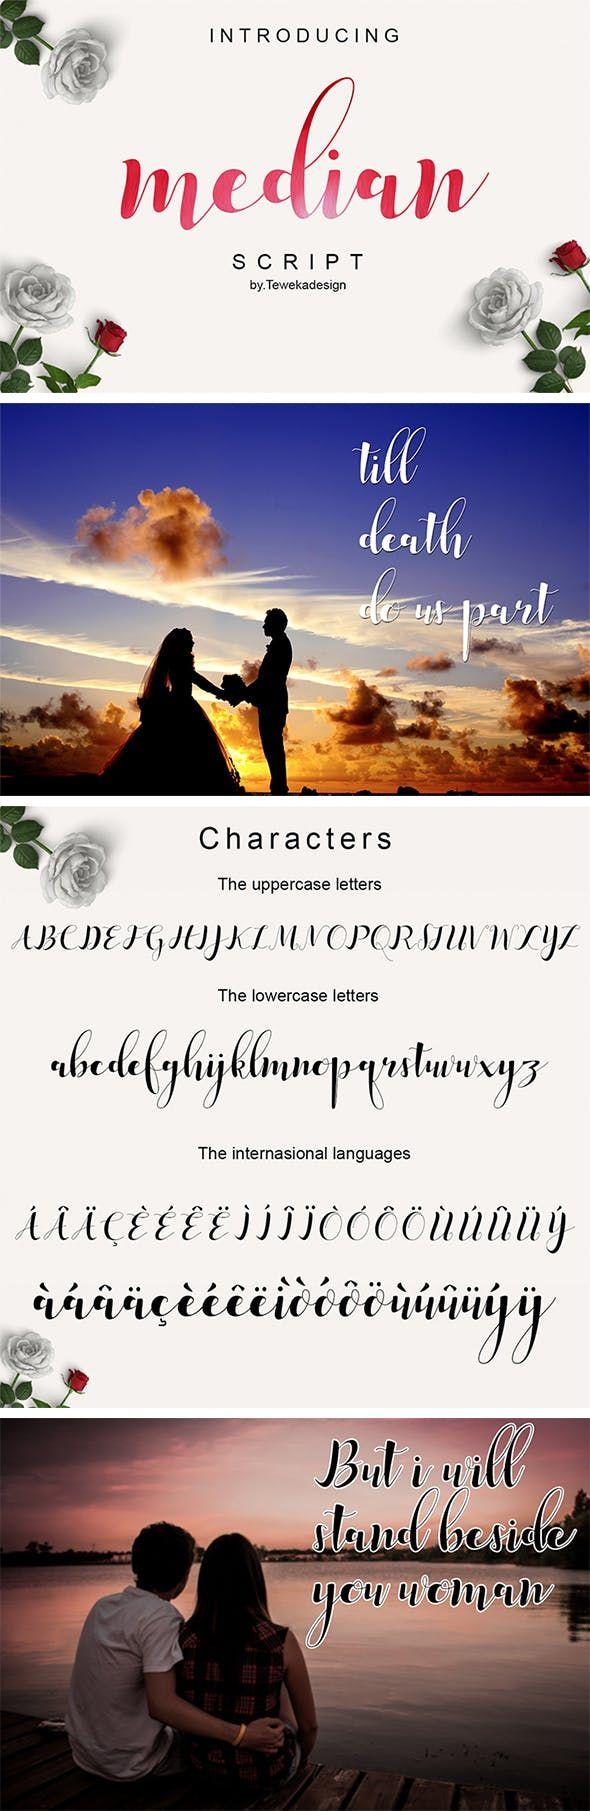 Median Script Edgy fonts, Best fonts for logos